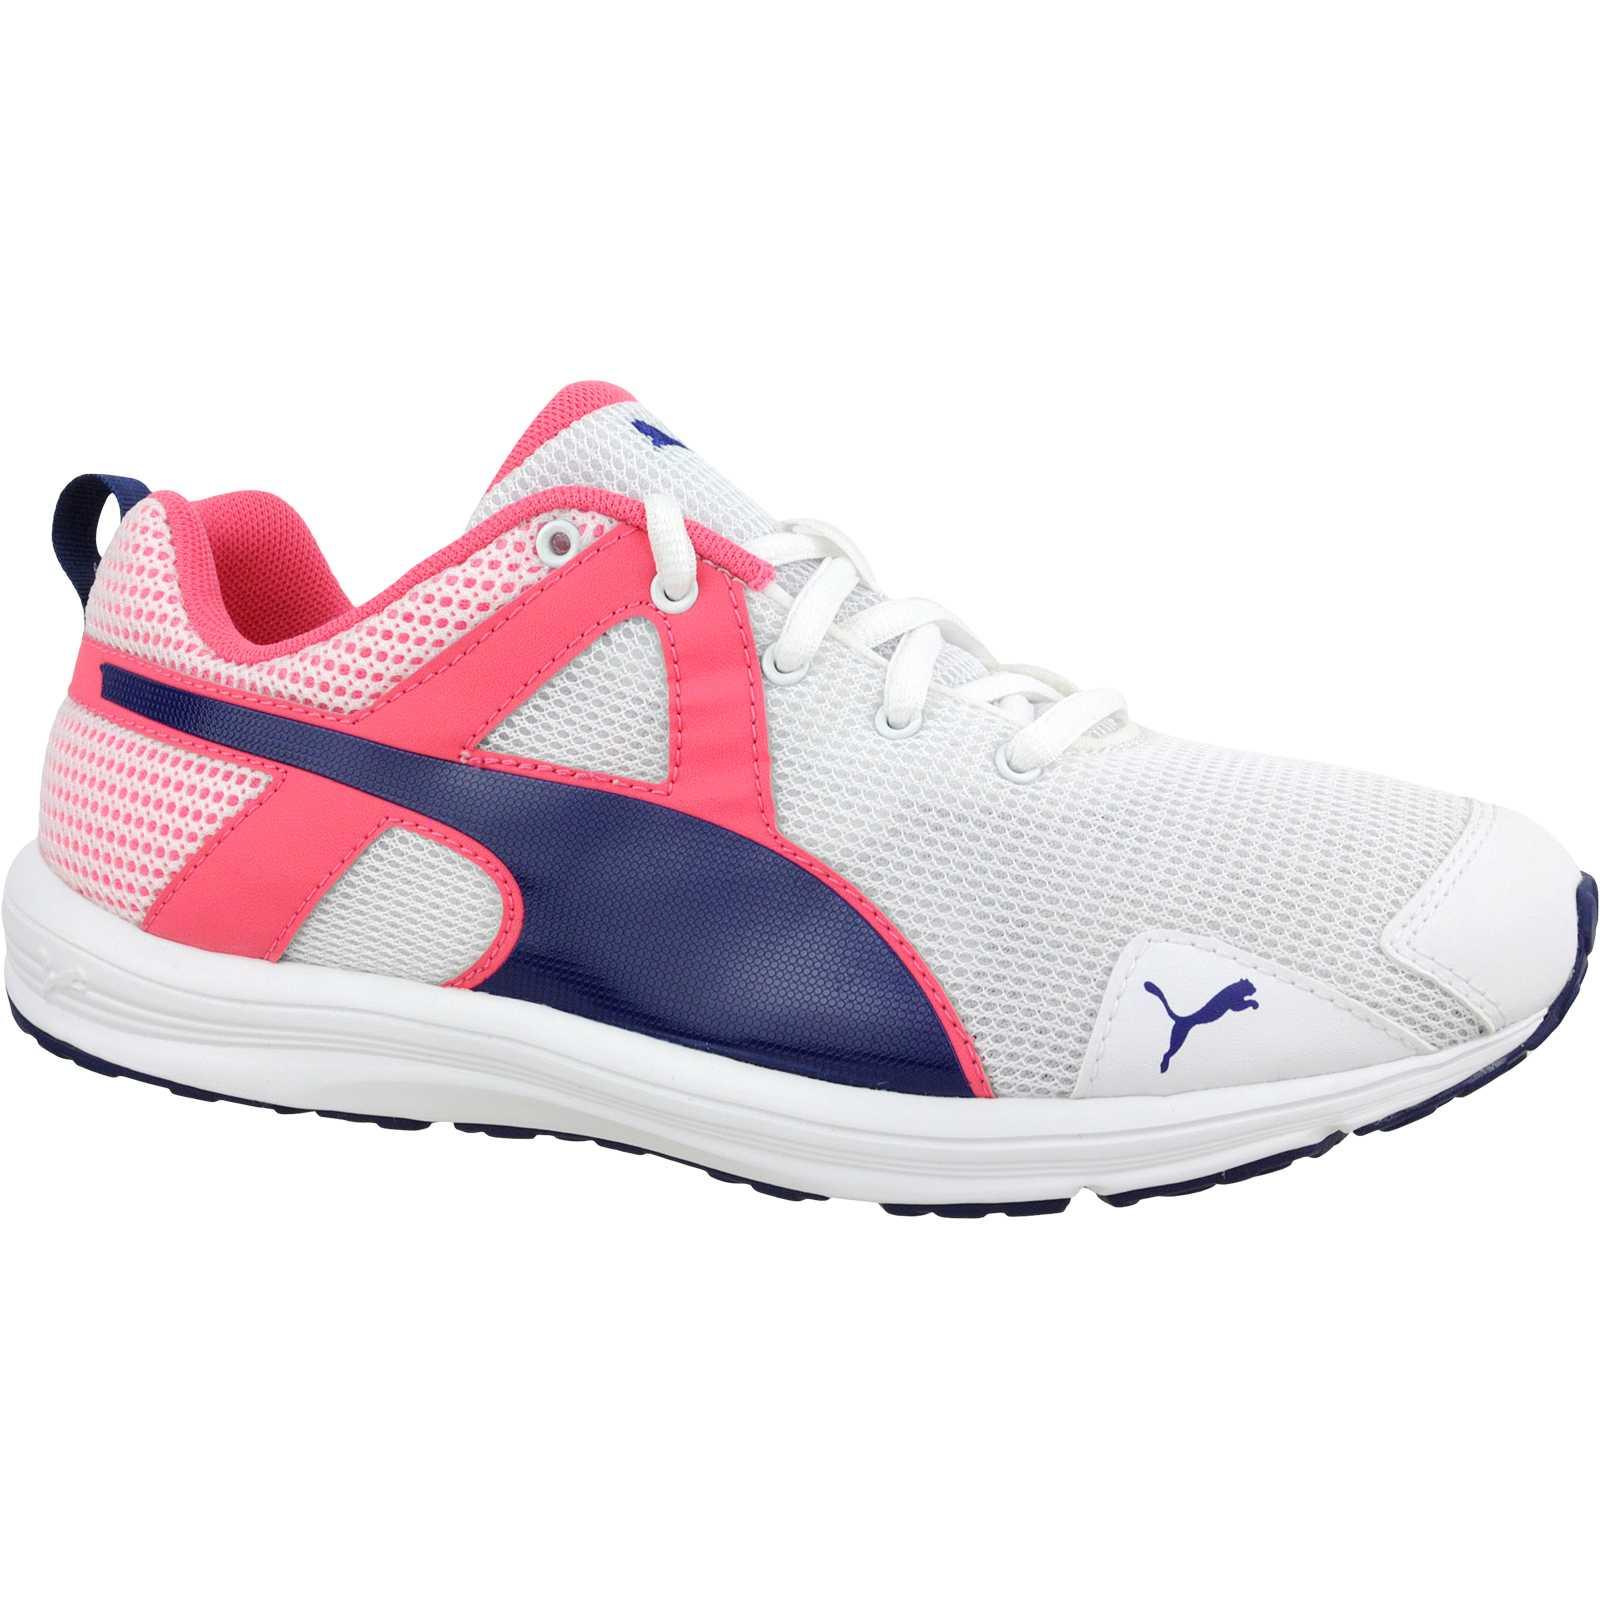 Pantofi sport femei Puma Evader Geo 18774605